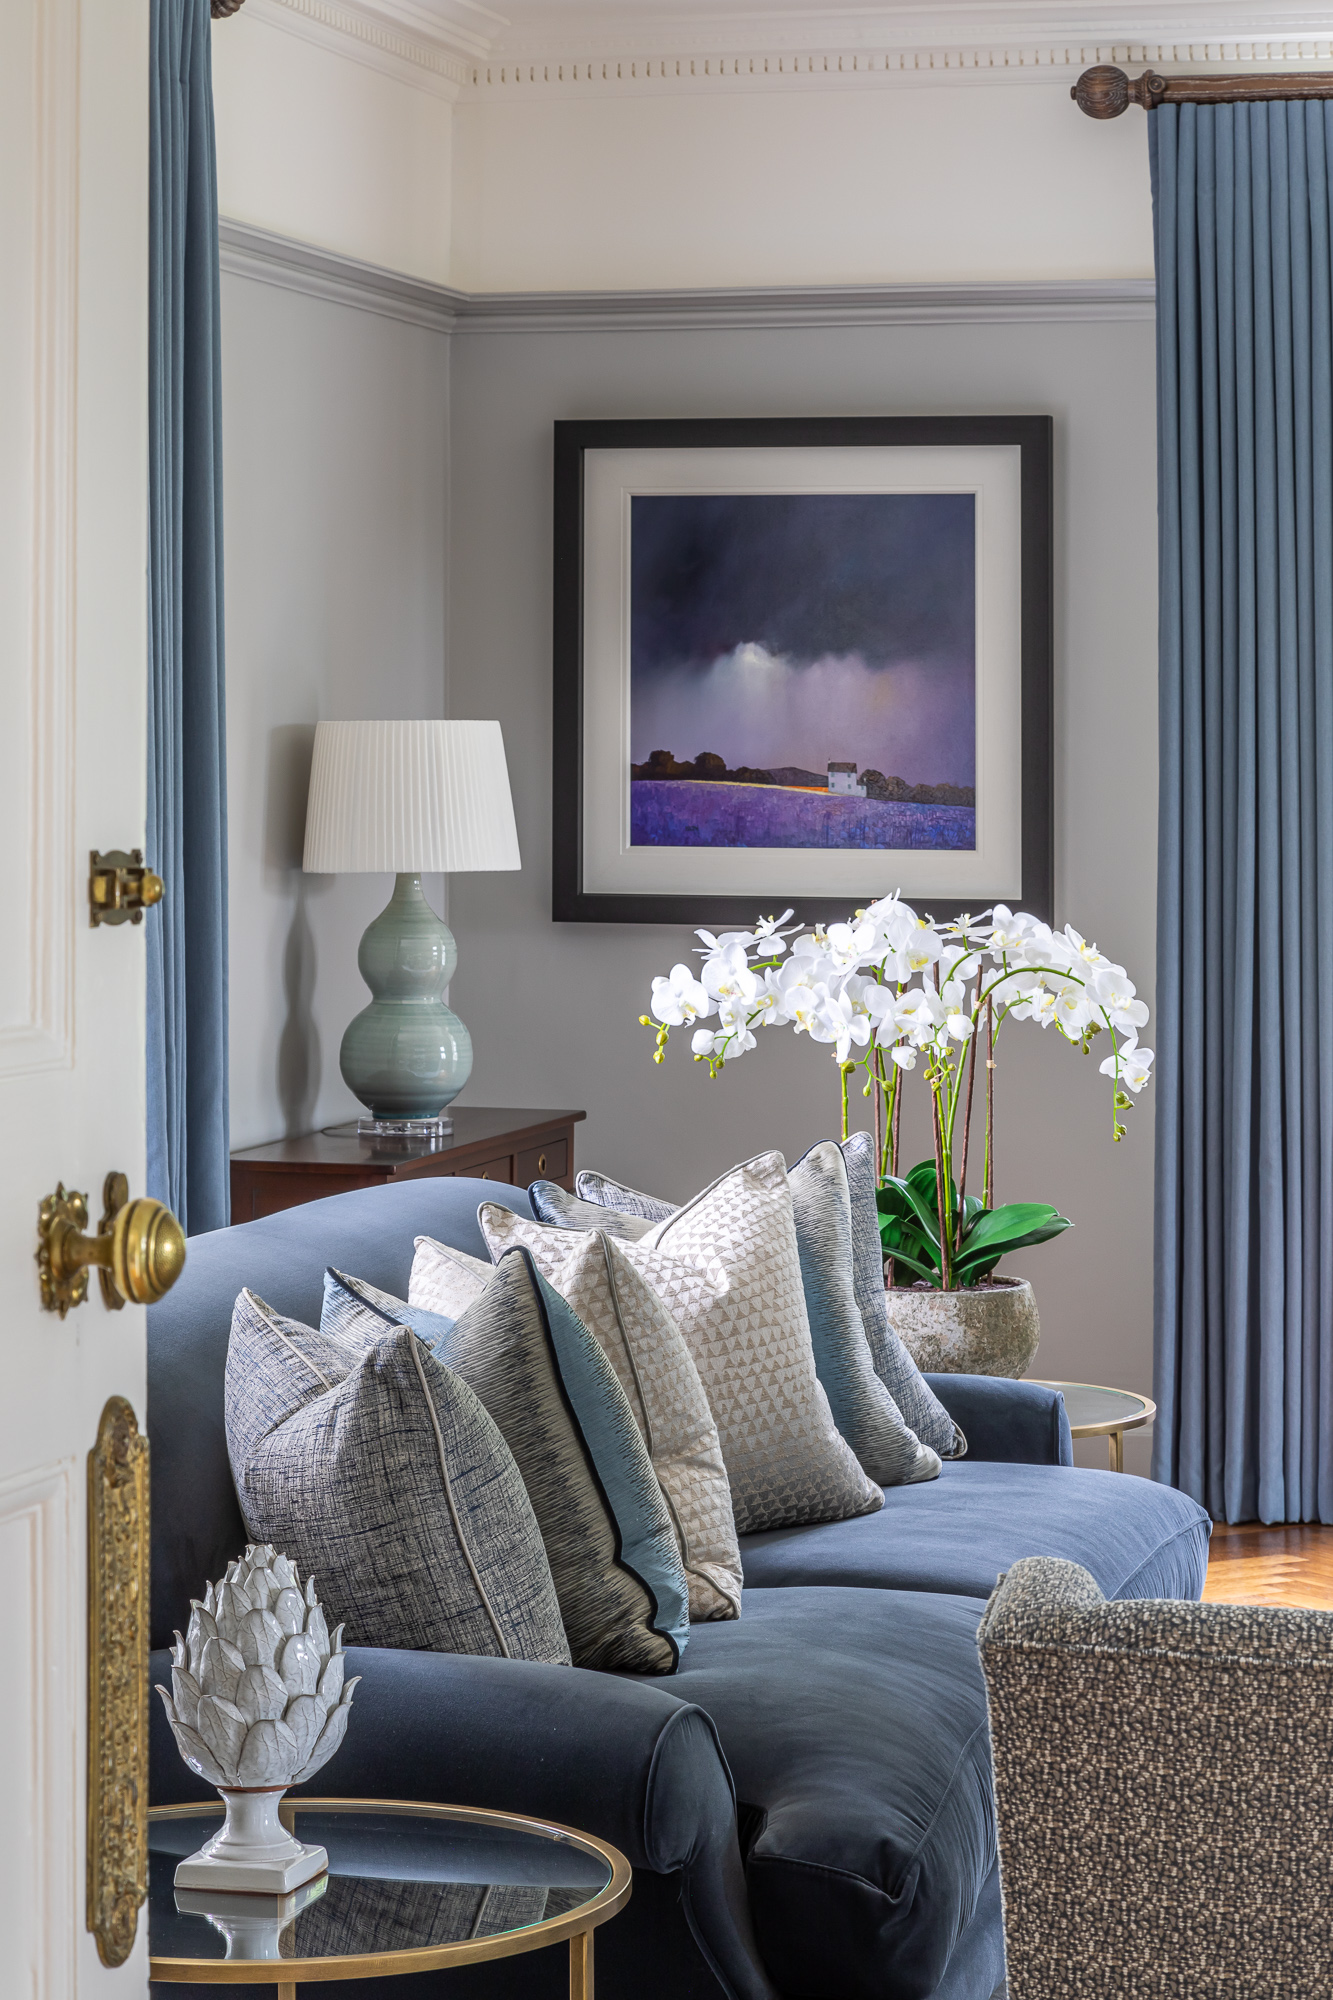 jonathan bond, interior photographer, view of settee in living room, great missenden, buckinghamshire